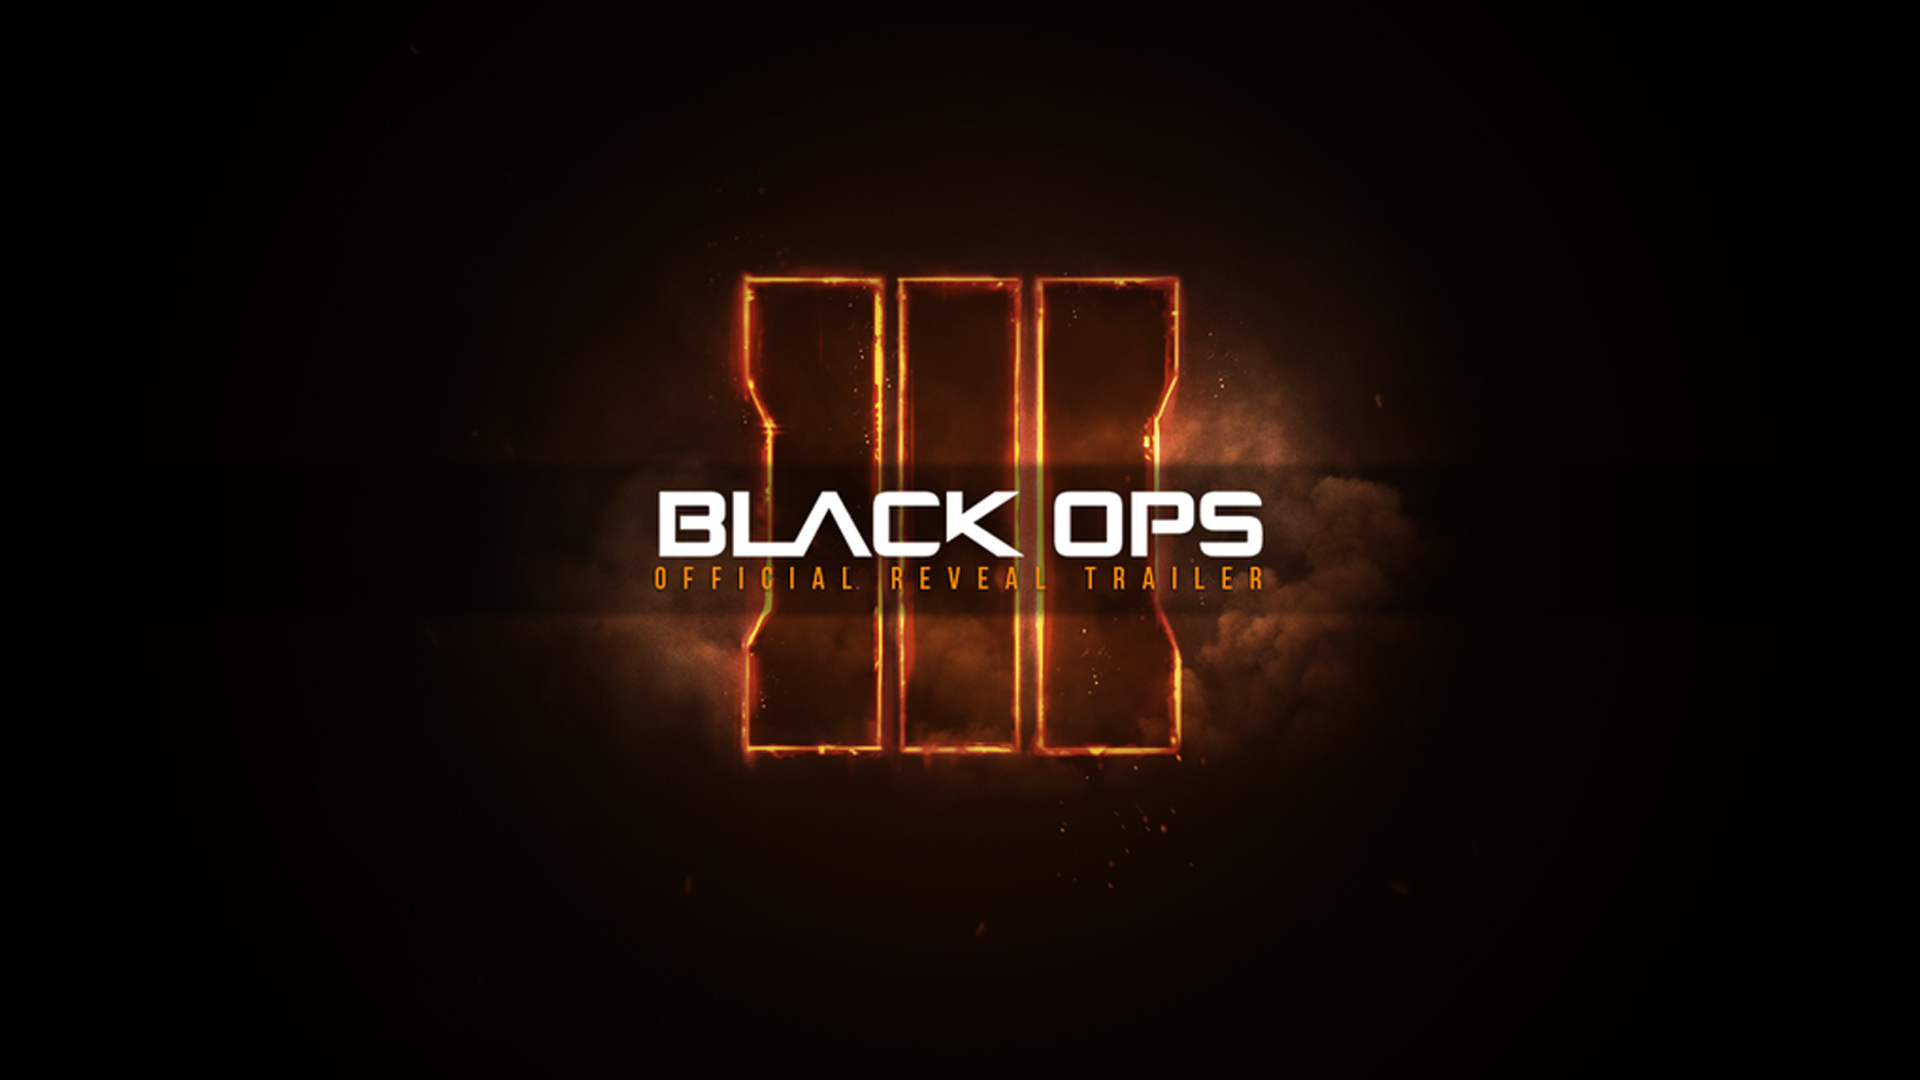 Call-Of-Duty-Black-Ops-3-Logo-Wallpaper